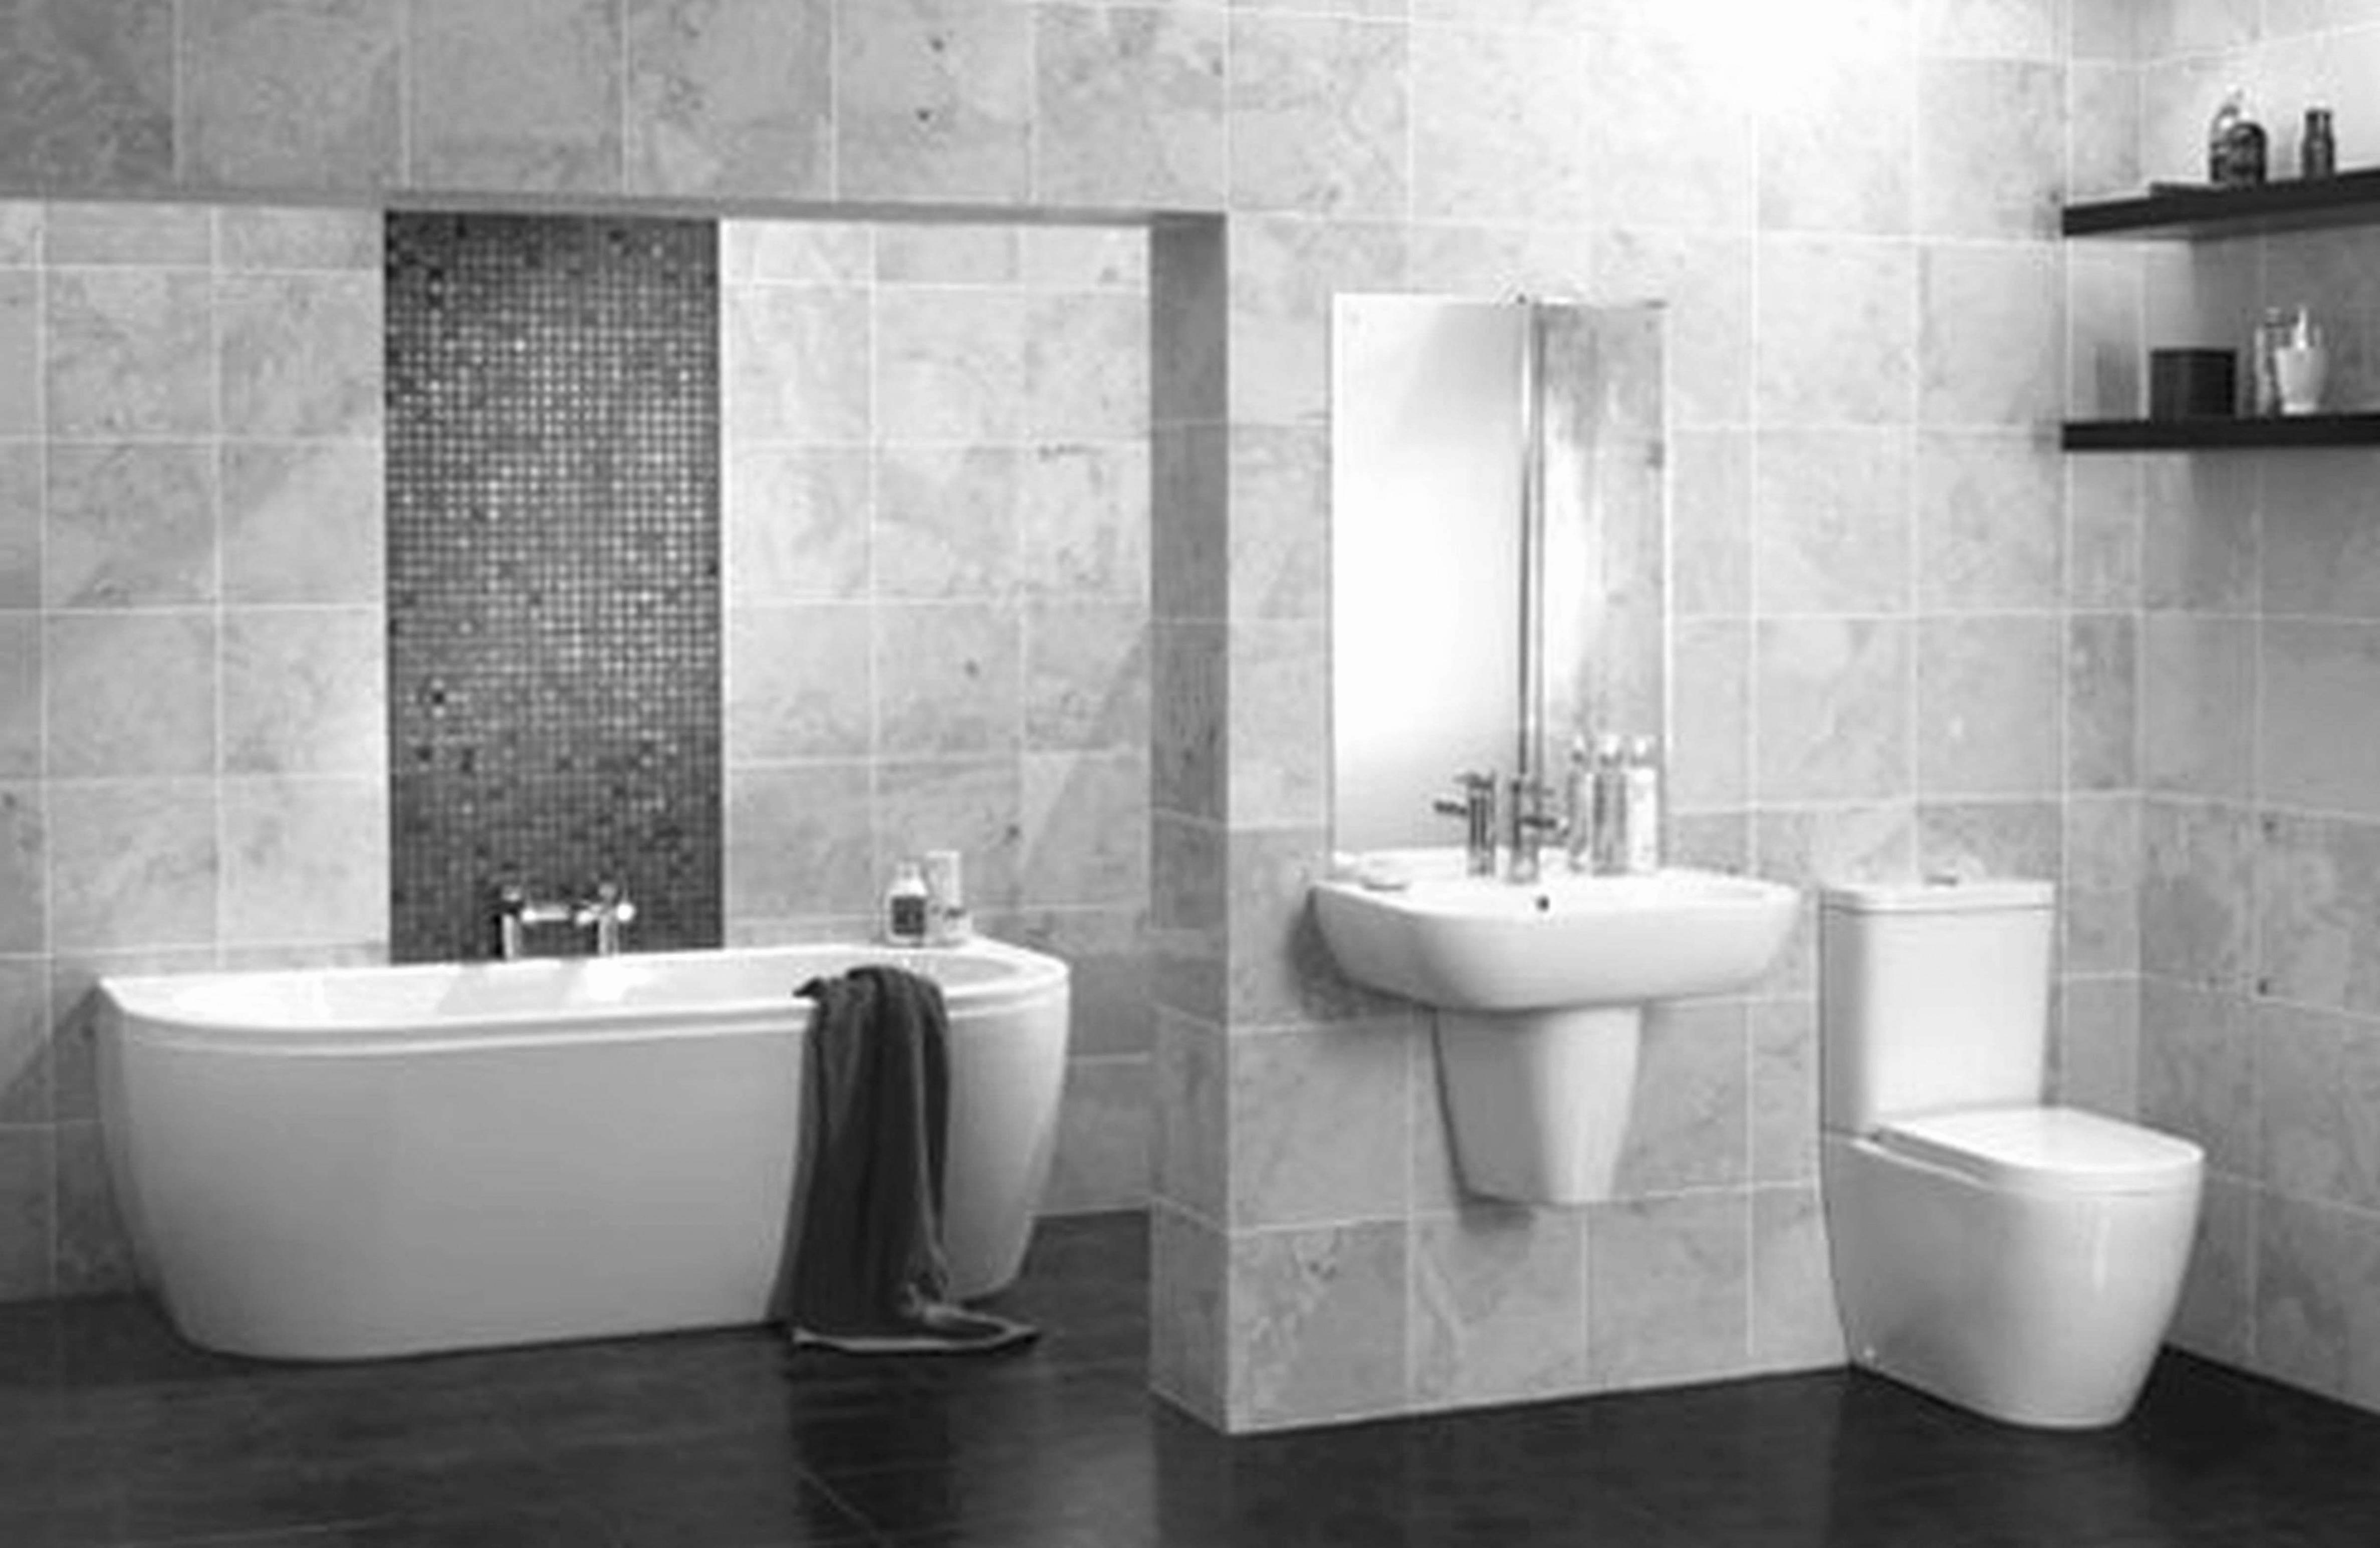 installing hardwood floors in bathroom of 14 best of gray hardwood floors image dizpos com with gray hardwood floors fresh furniture design gray hardwood floors beautiful 0d grace place photos of 14